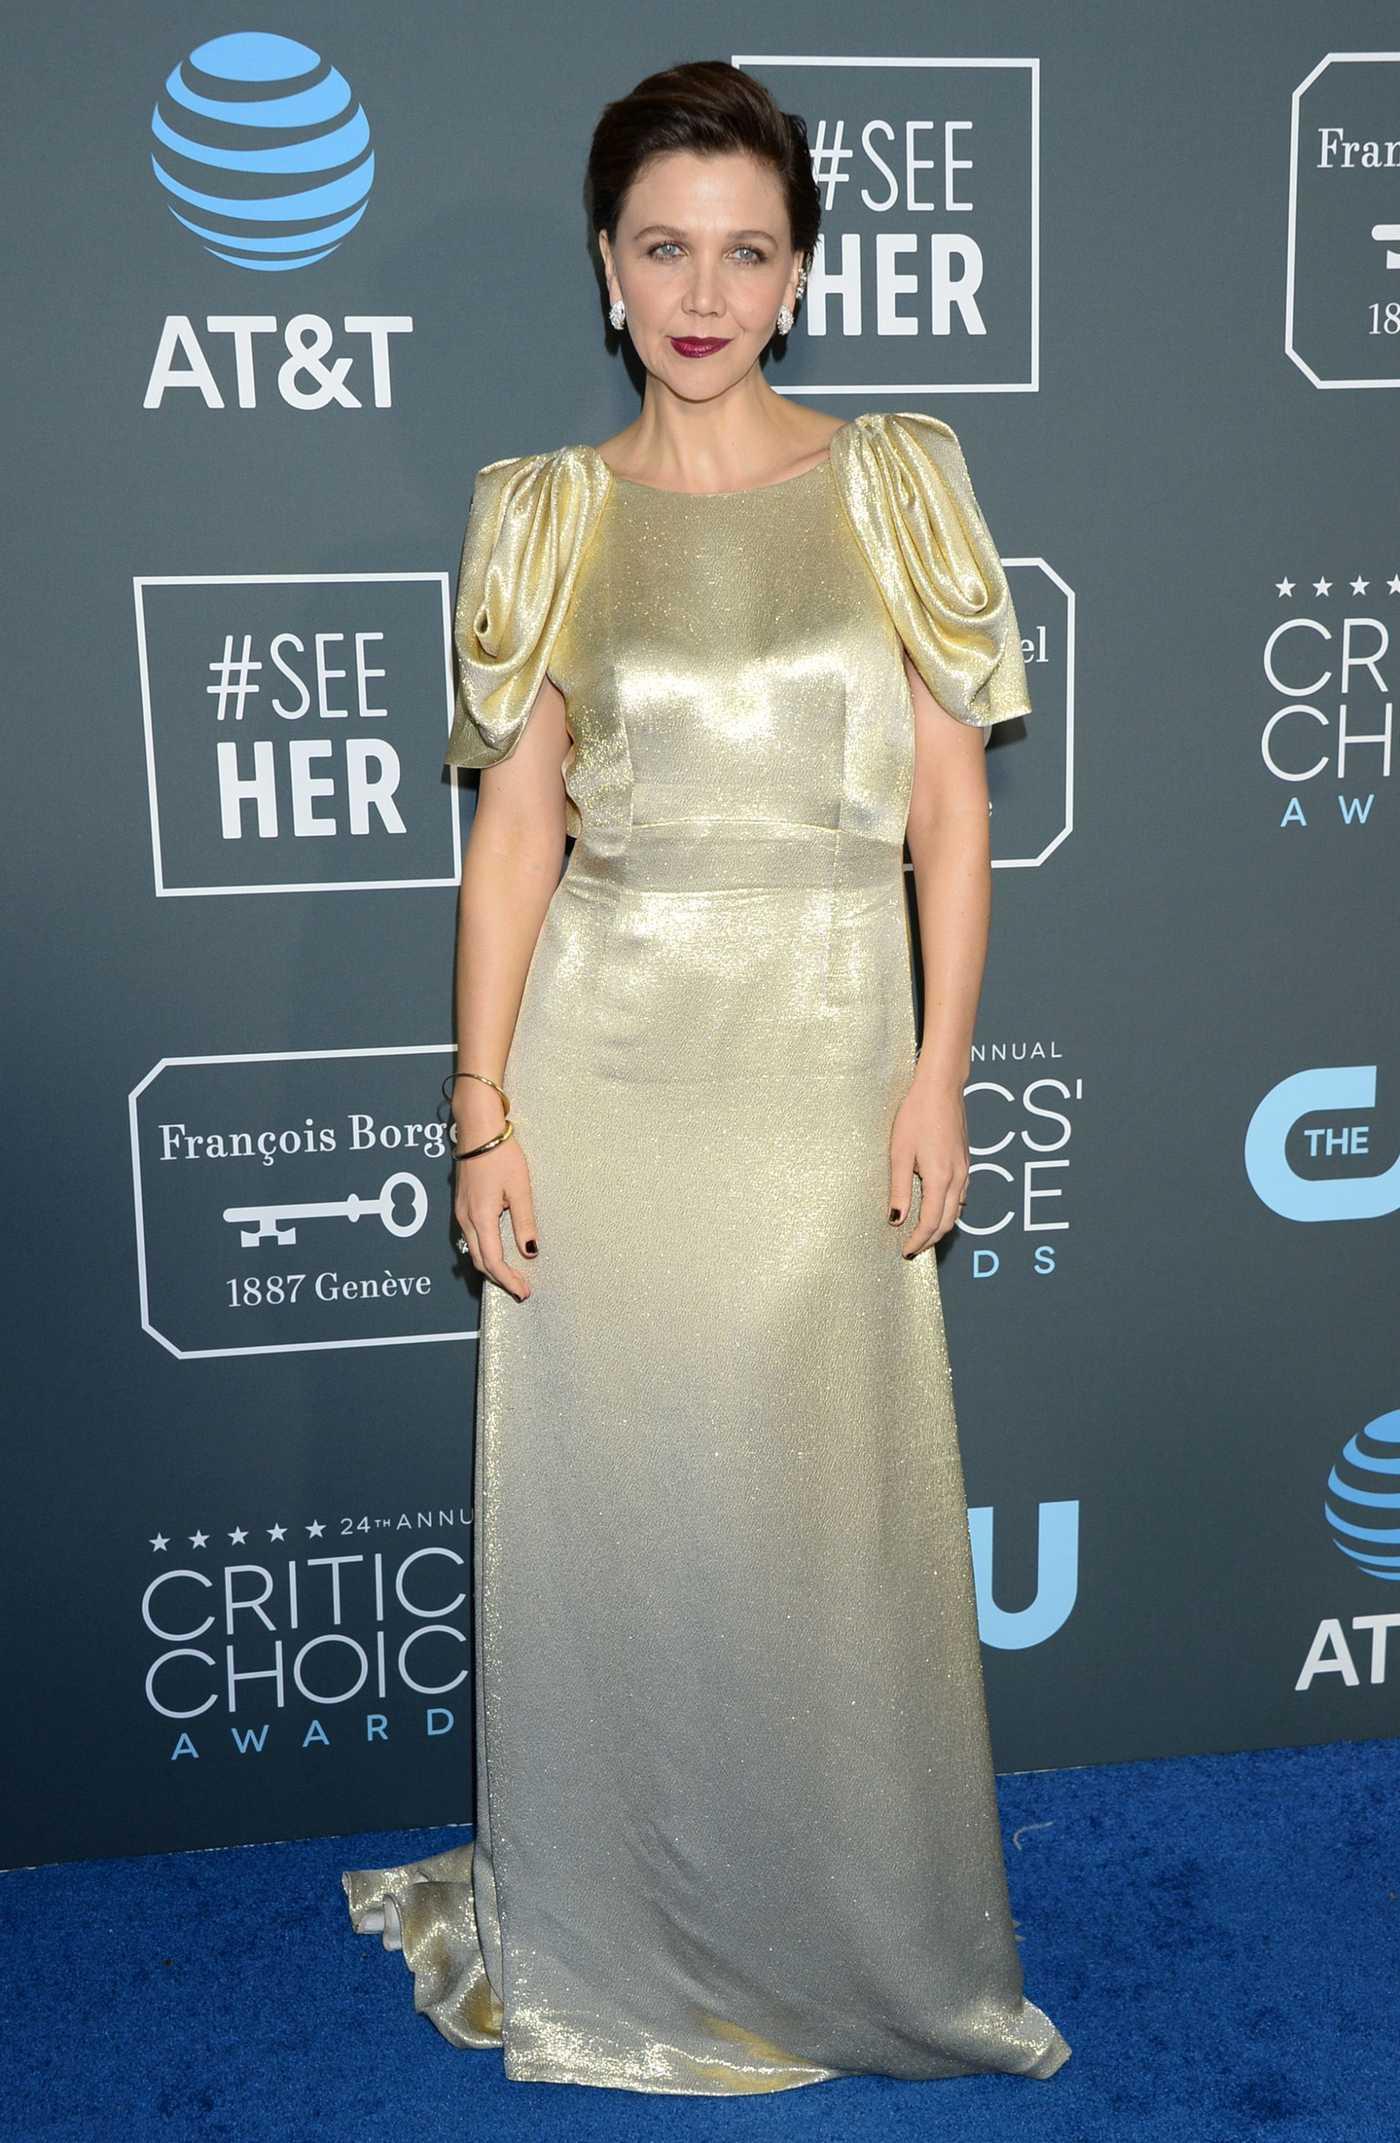 Maggie Gyllenhaal Attends the 24th Annual Critics' Choice Awards at Barker Hangar in Santa Monica 01/13/2019